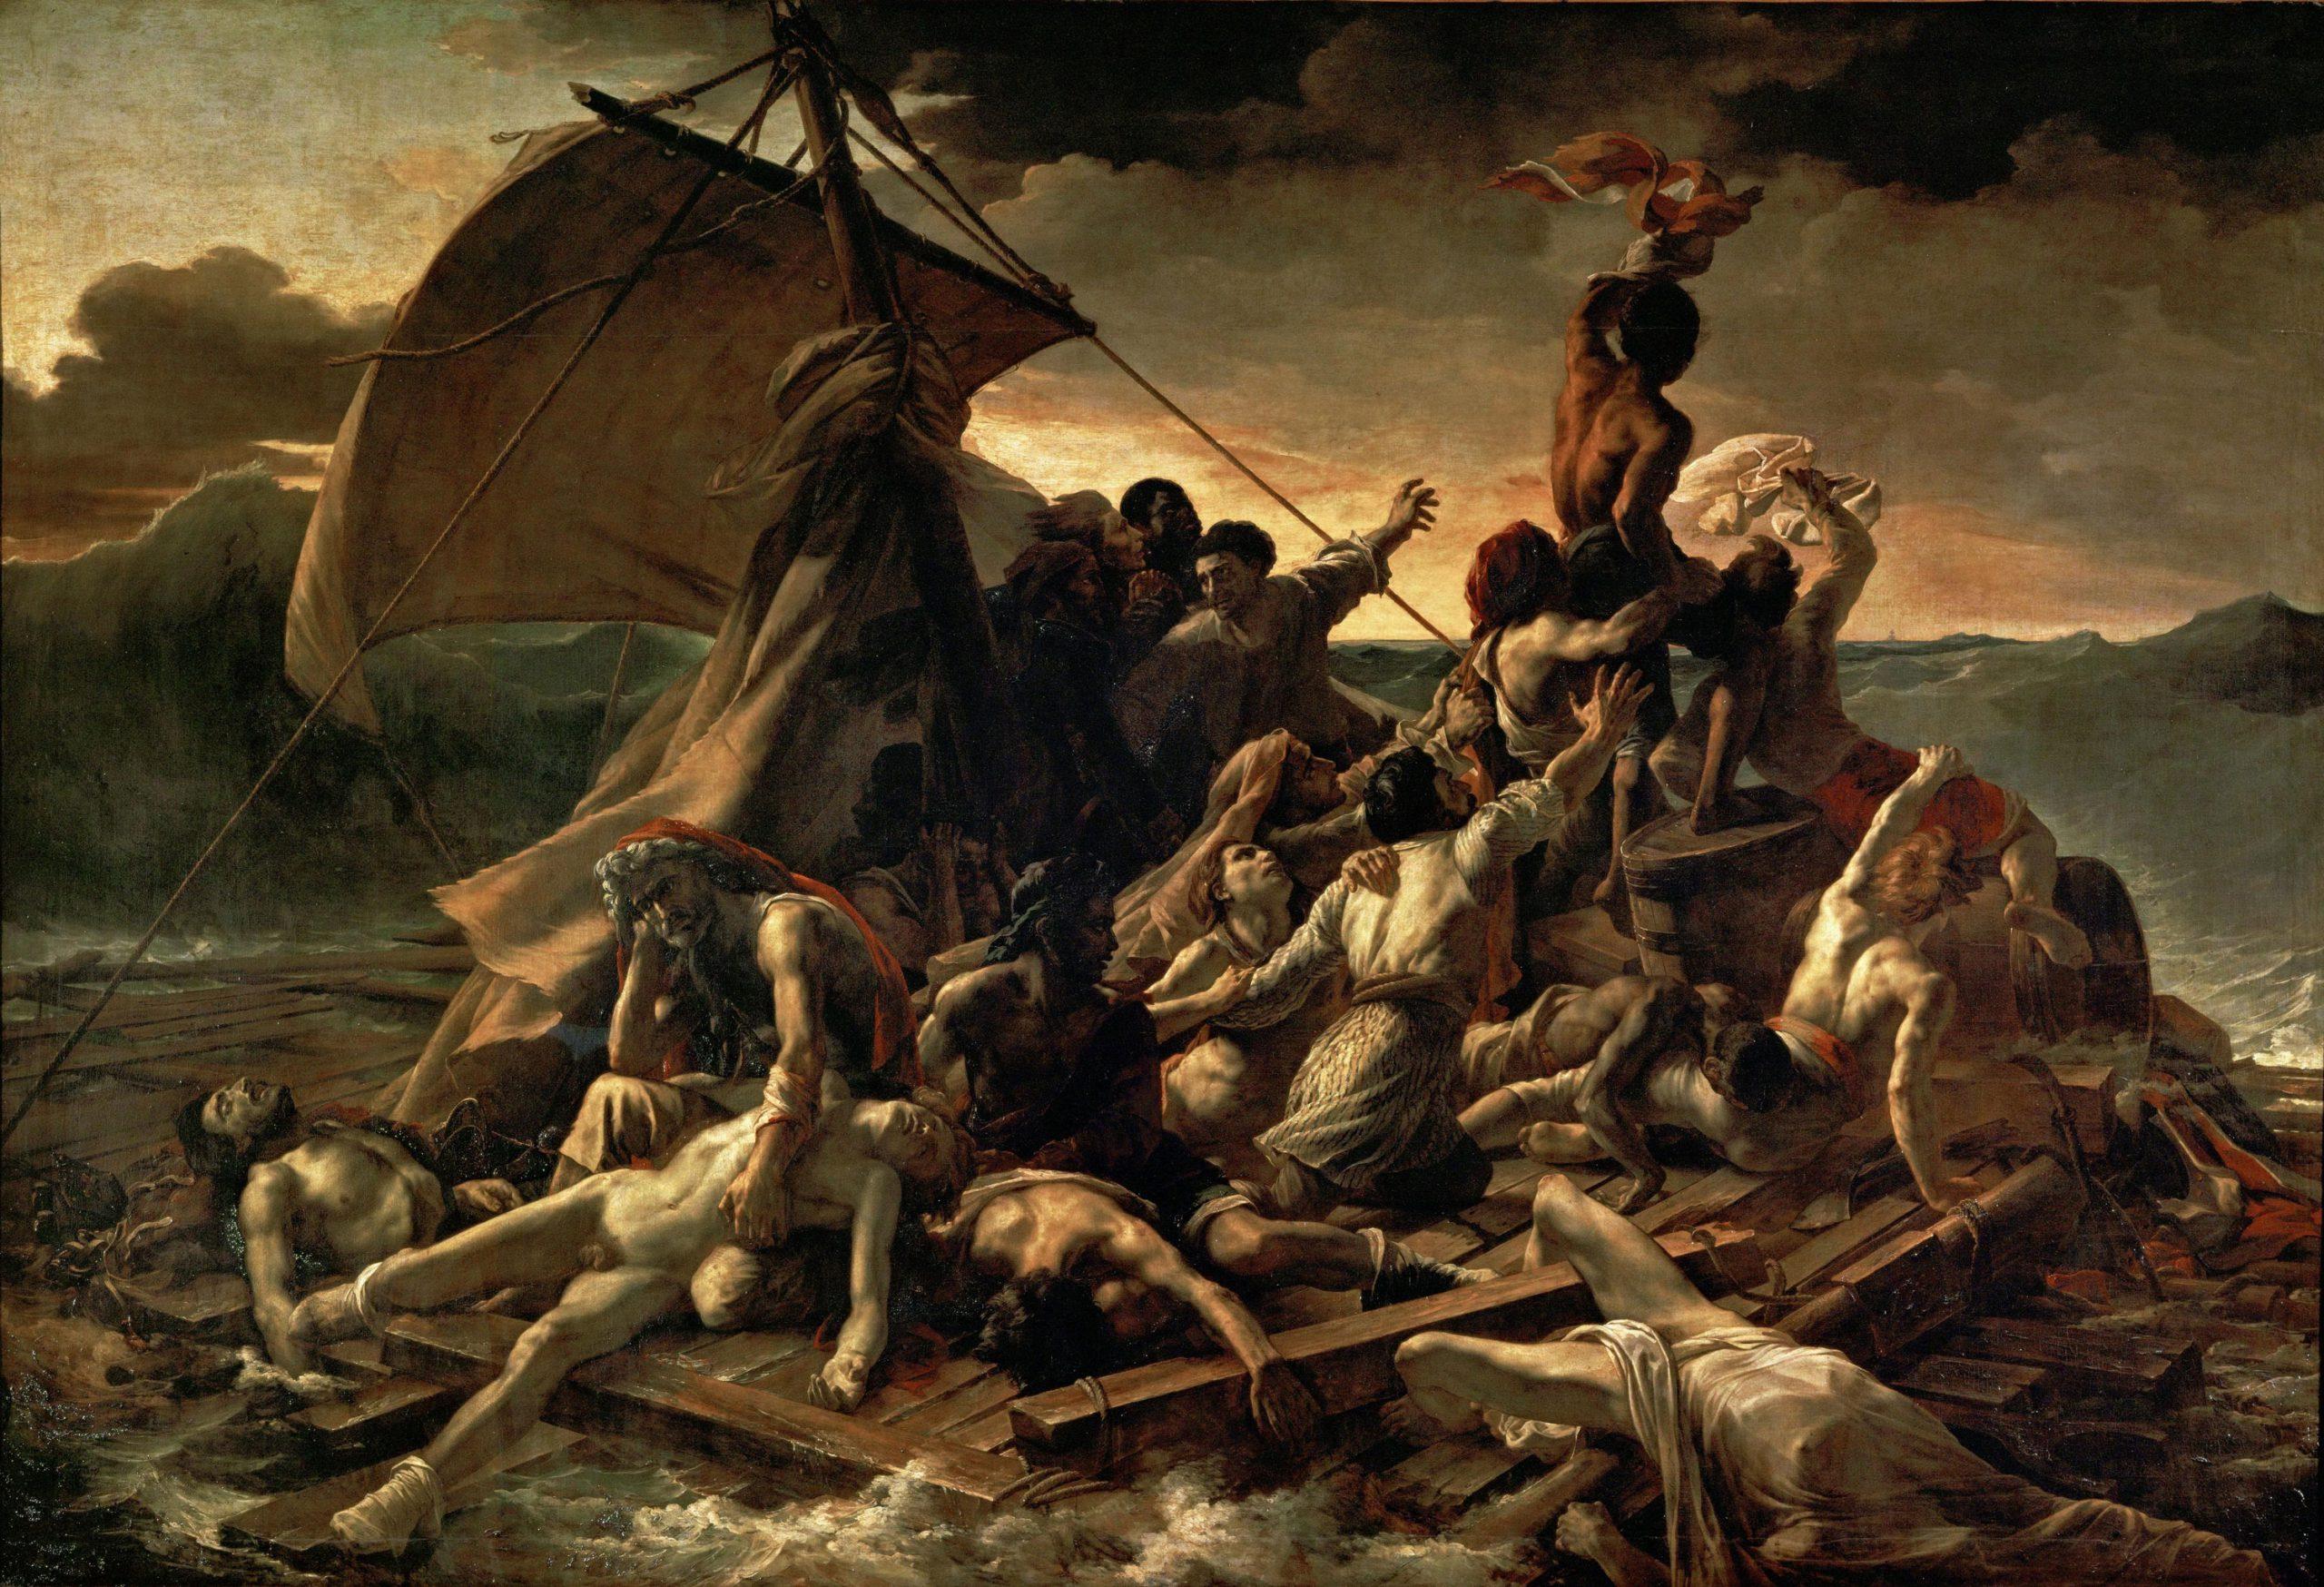 Theodore-Gericault-The-Raft-of-the-Medusa-1818-19